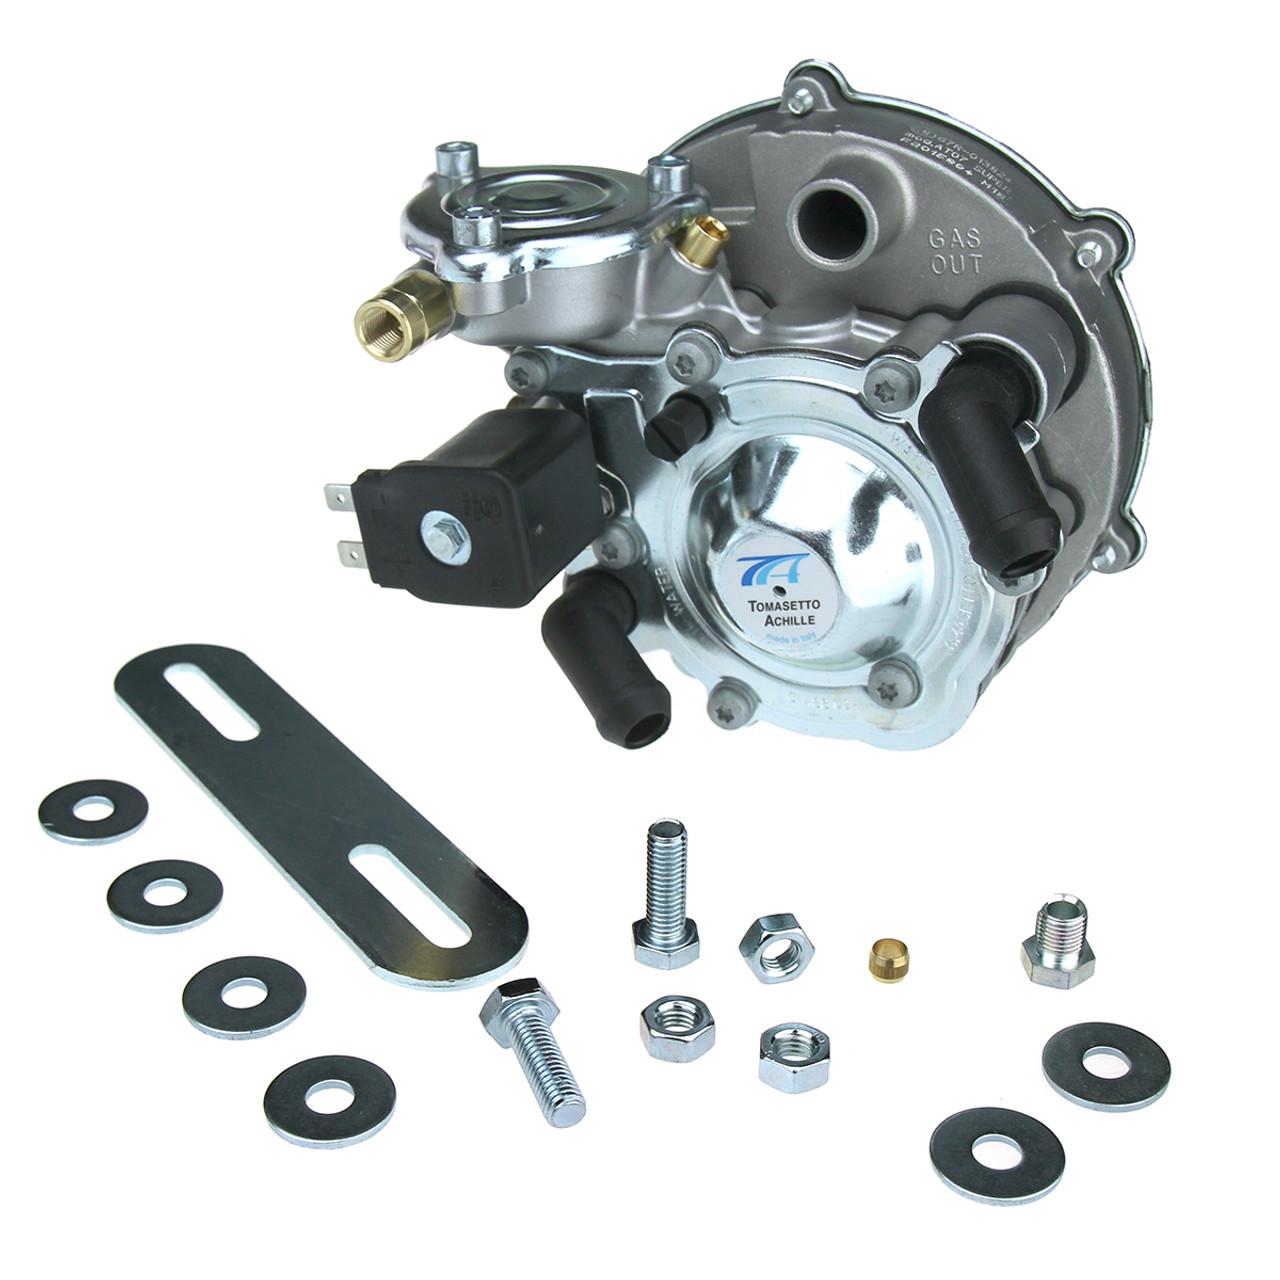 Tomasetto LPG Autogas Verdampfer Druckminderer AT07 100 HP RGAT3500